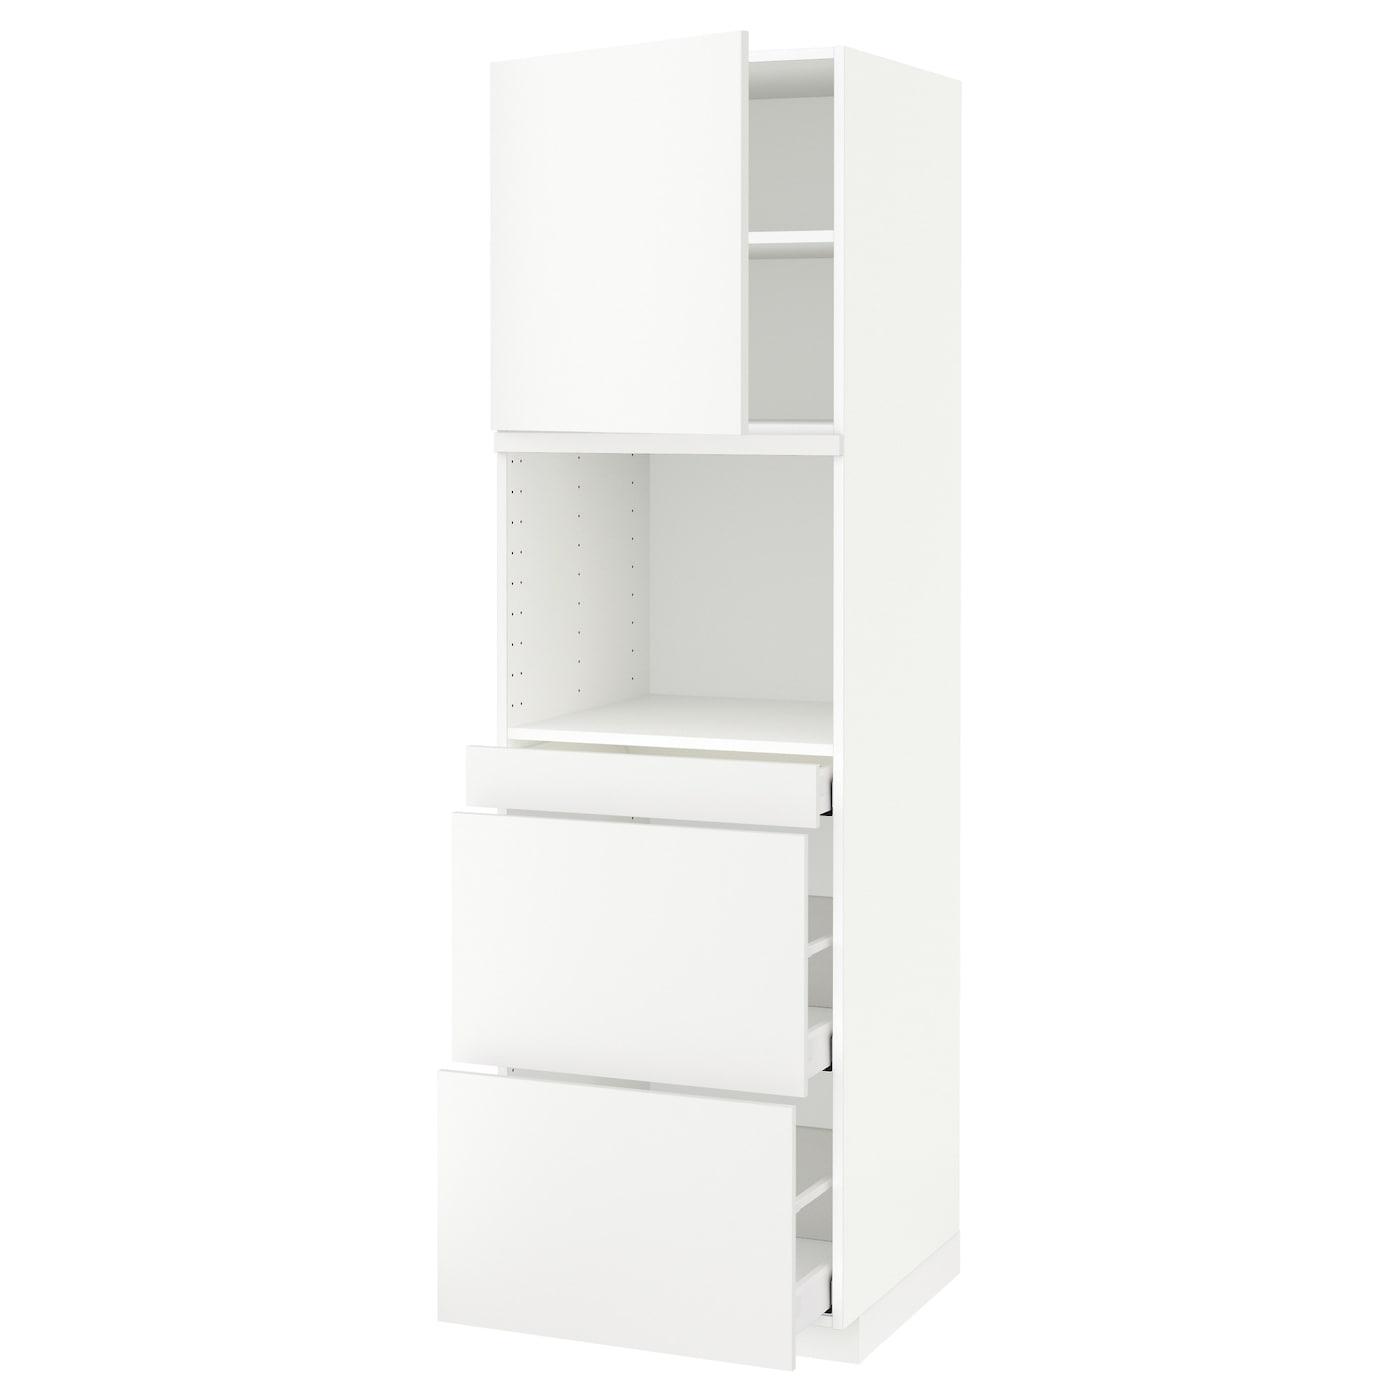 Meuble Micro Onde Ikea metod / maximera hi cab f micro combi w door/3 drwrs - white, häggeby white  60x60x200 cm